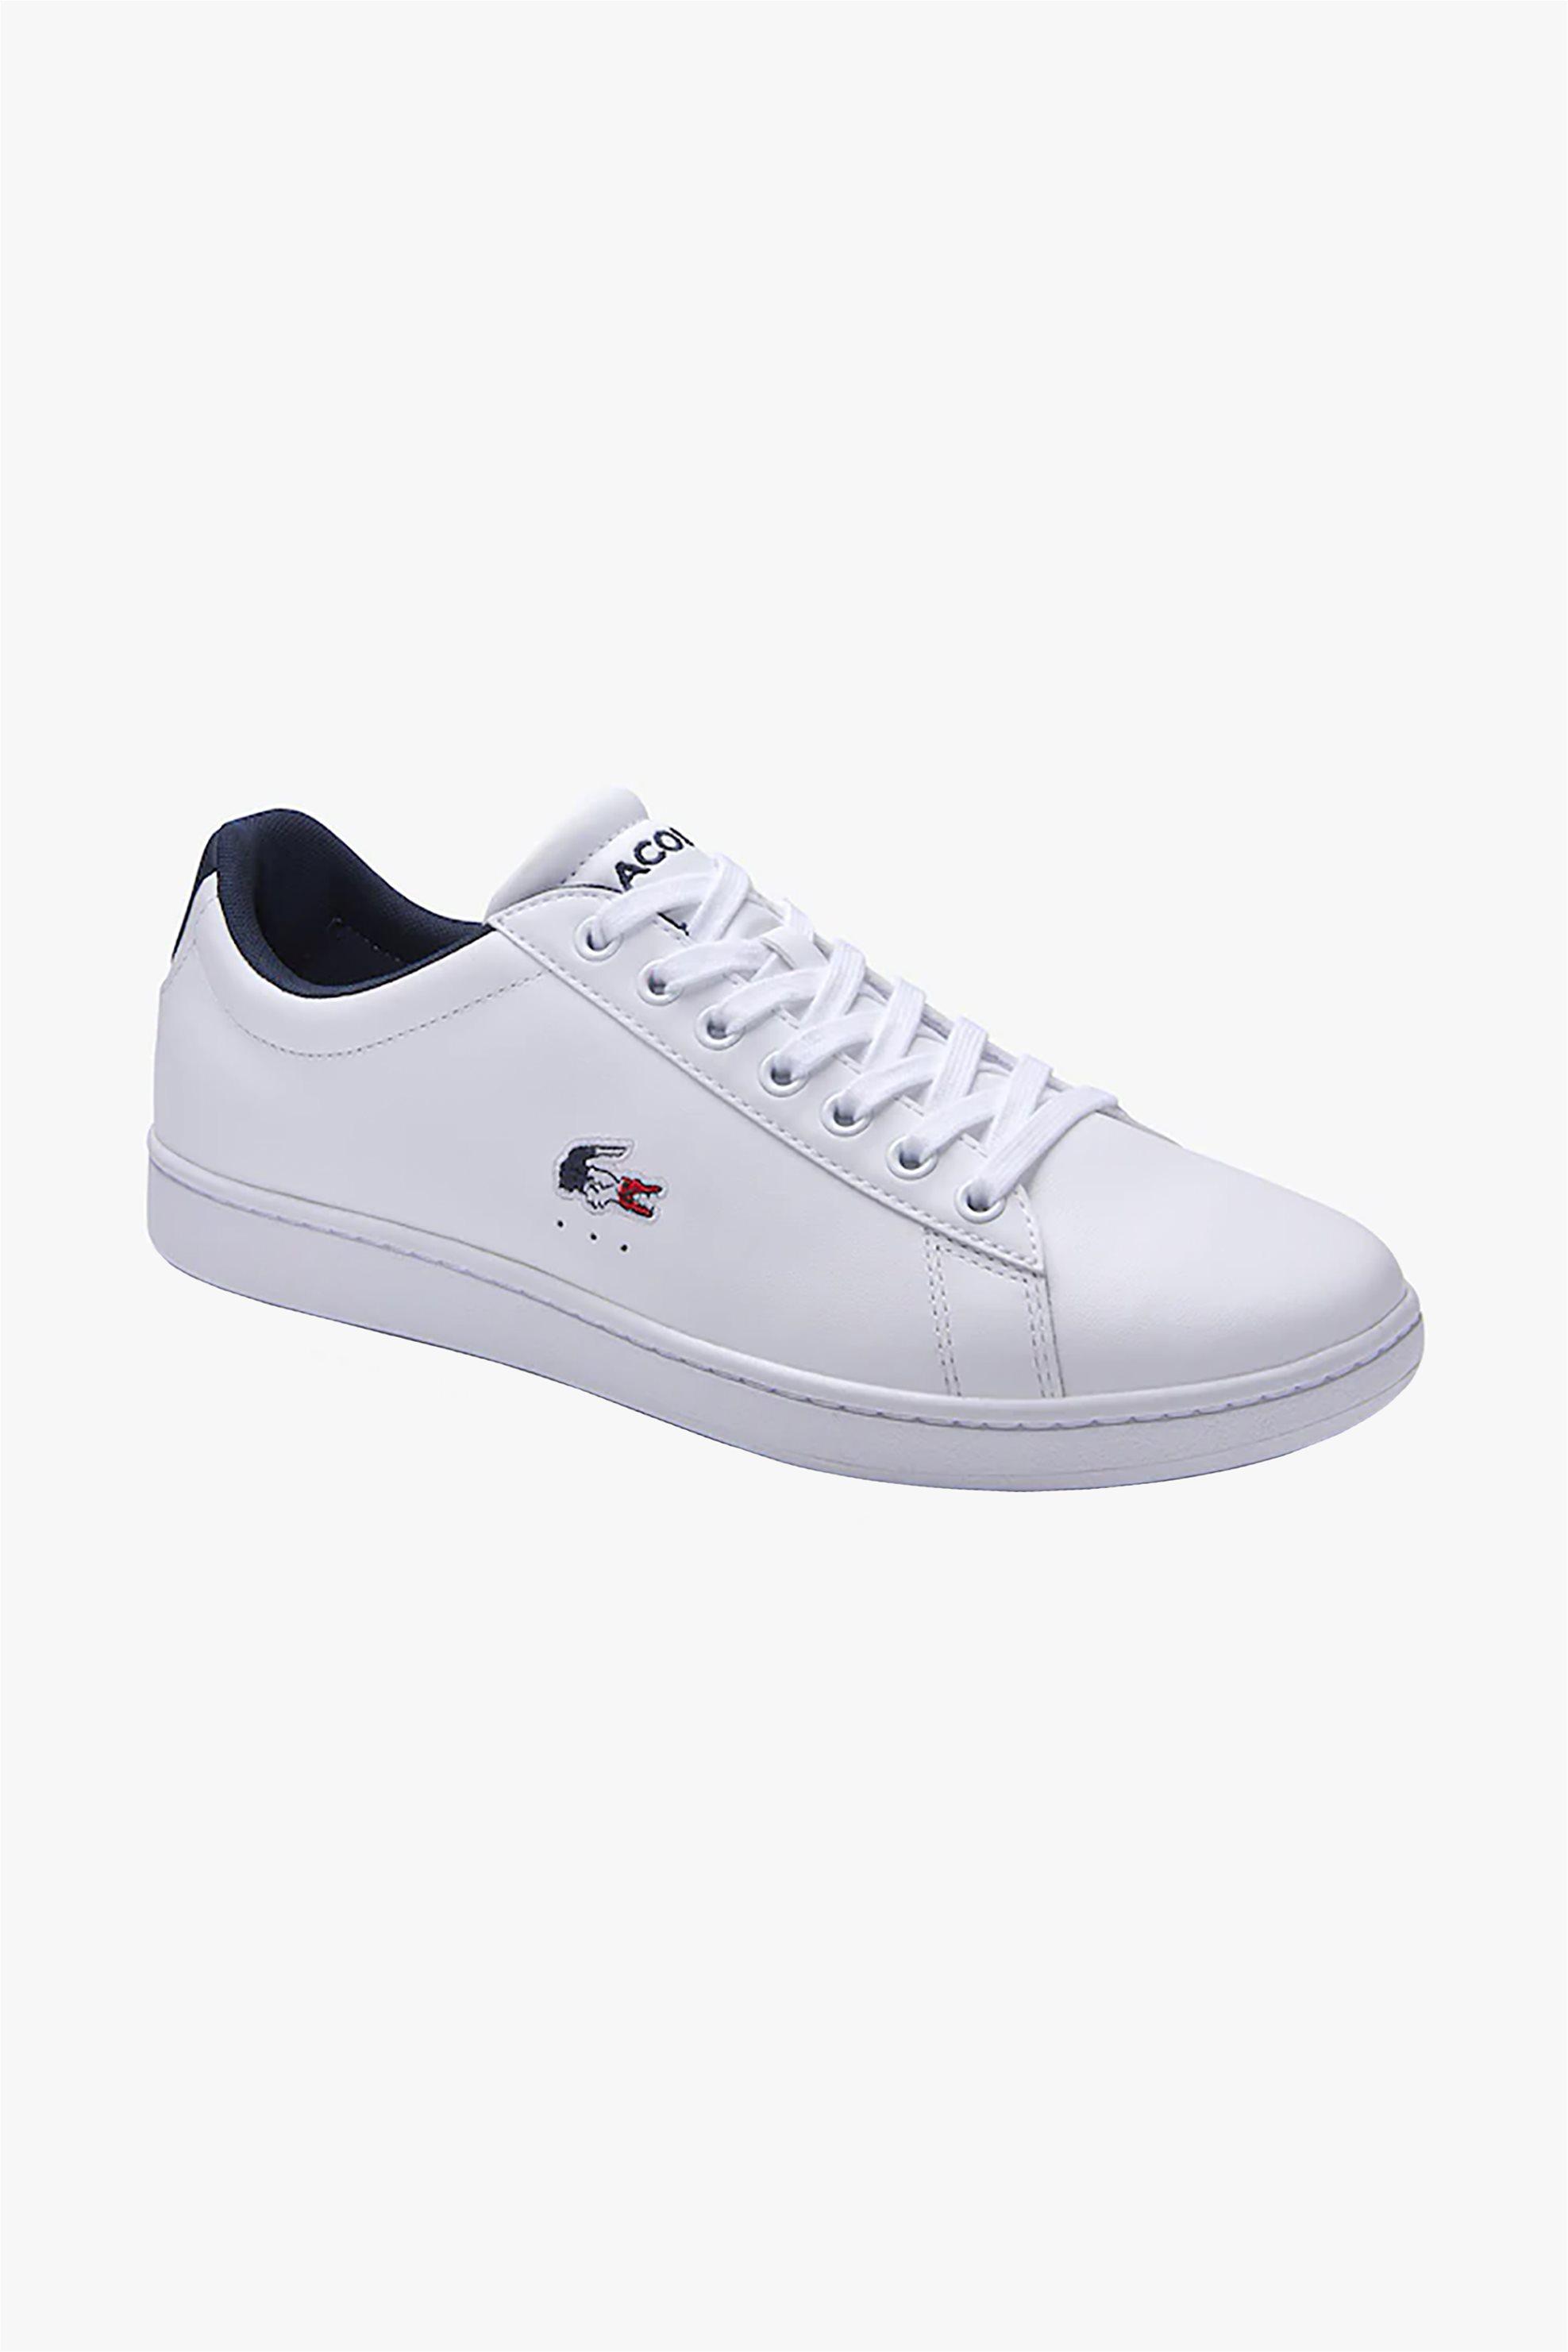 "Lacoste ανδρικά παπούτσια ""Carnaby Evo"" – 39SMA0033407 – Λευκό"